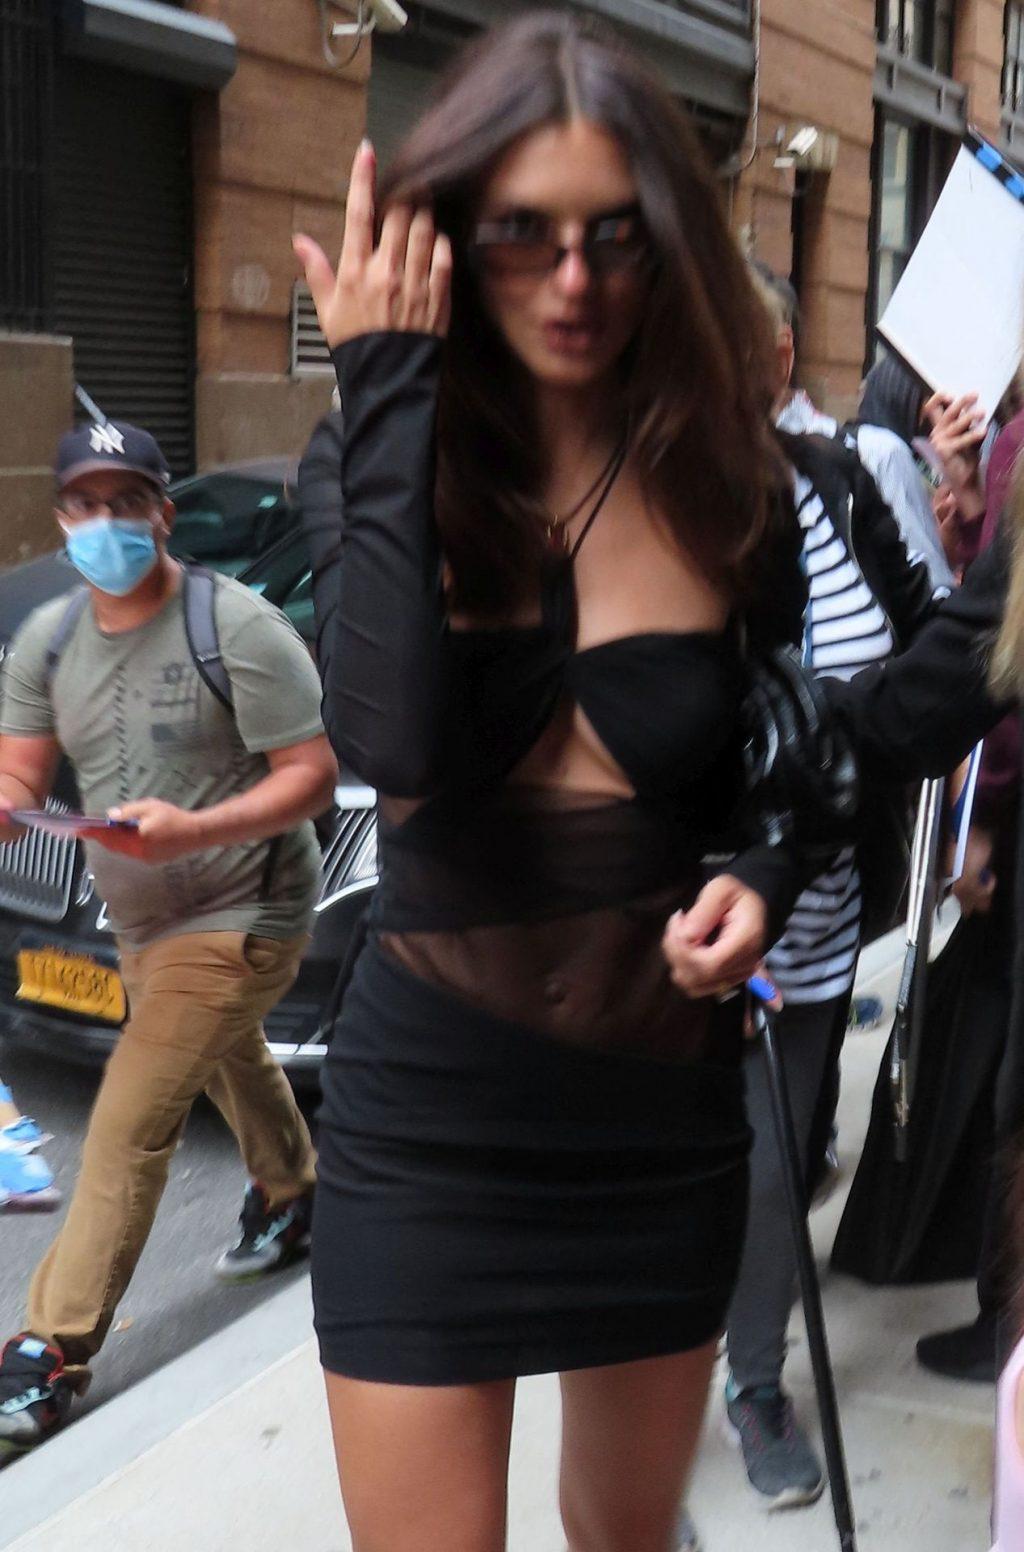 Leggy Emily Ratajkowski Arrives at the Spring Studios for Tribeca Festival (89 Photos)